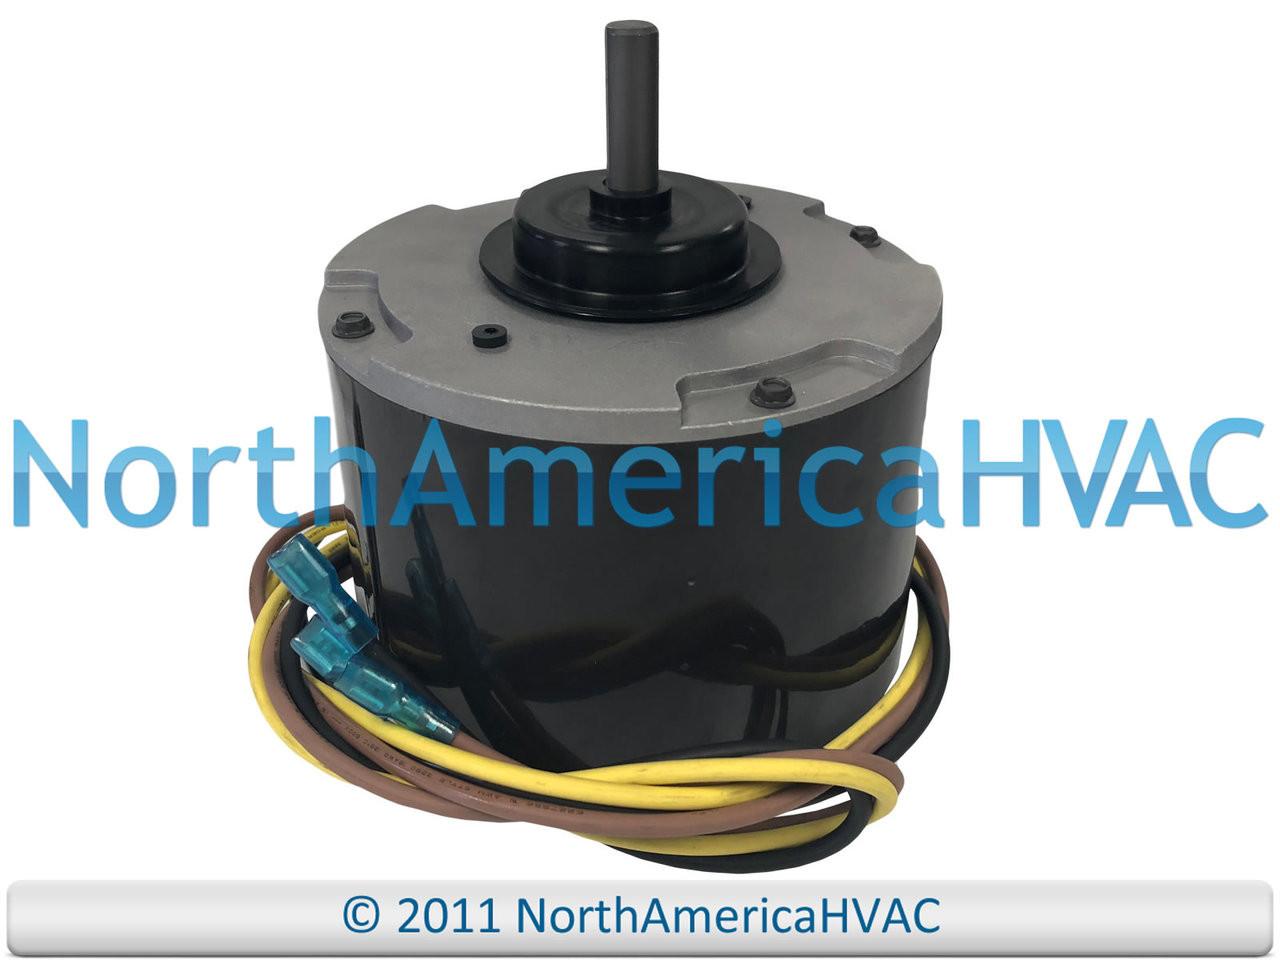 Bryant GE Genteq Replacement Condenser Fan Motor 1/4 HP 460/400 ...